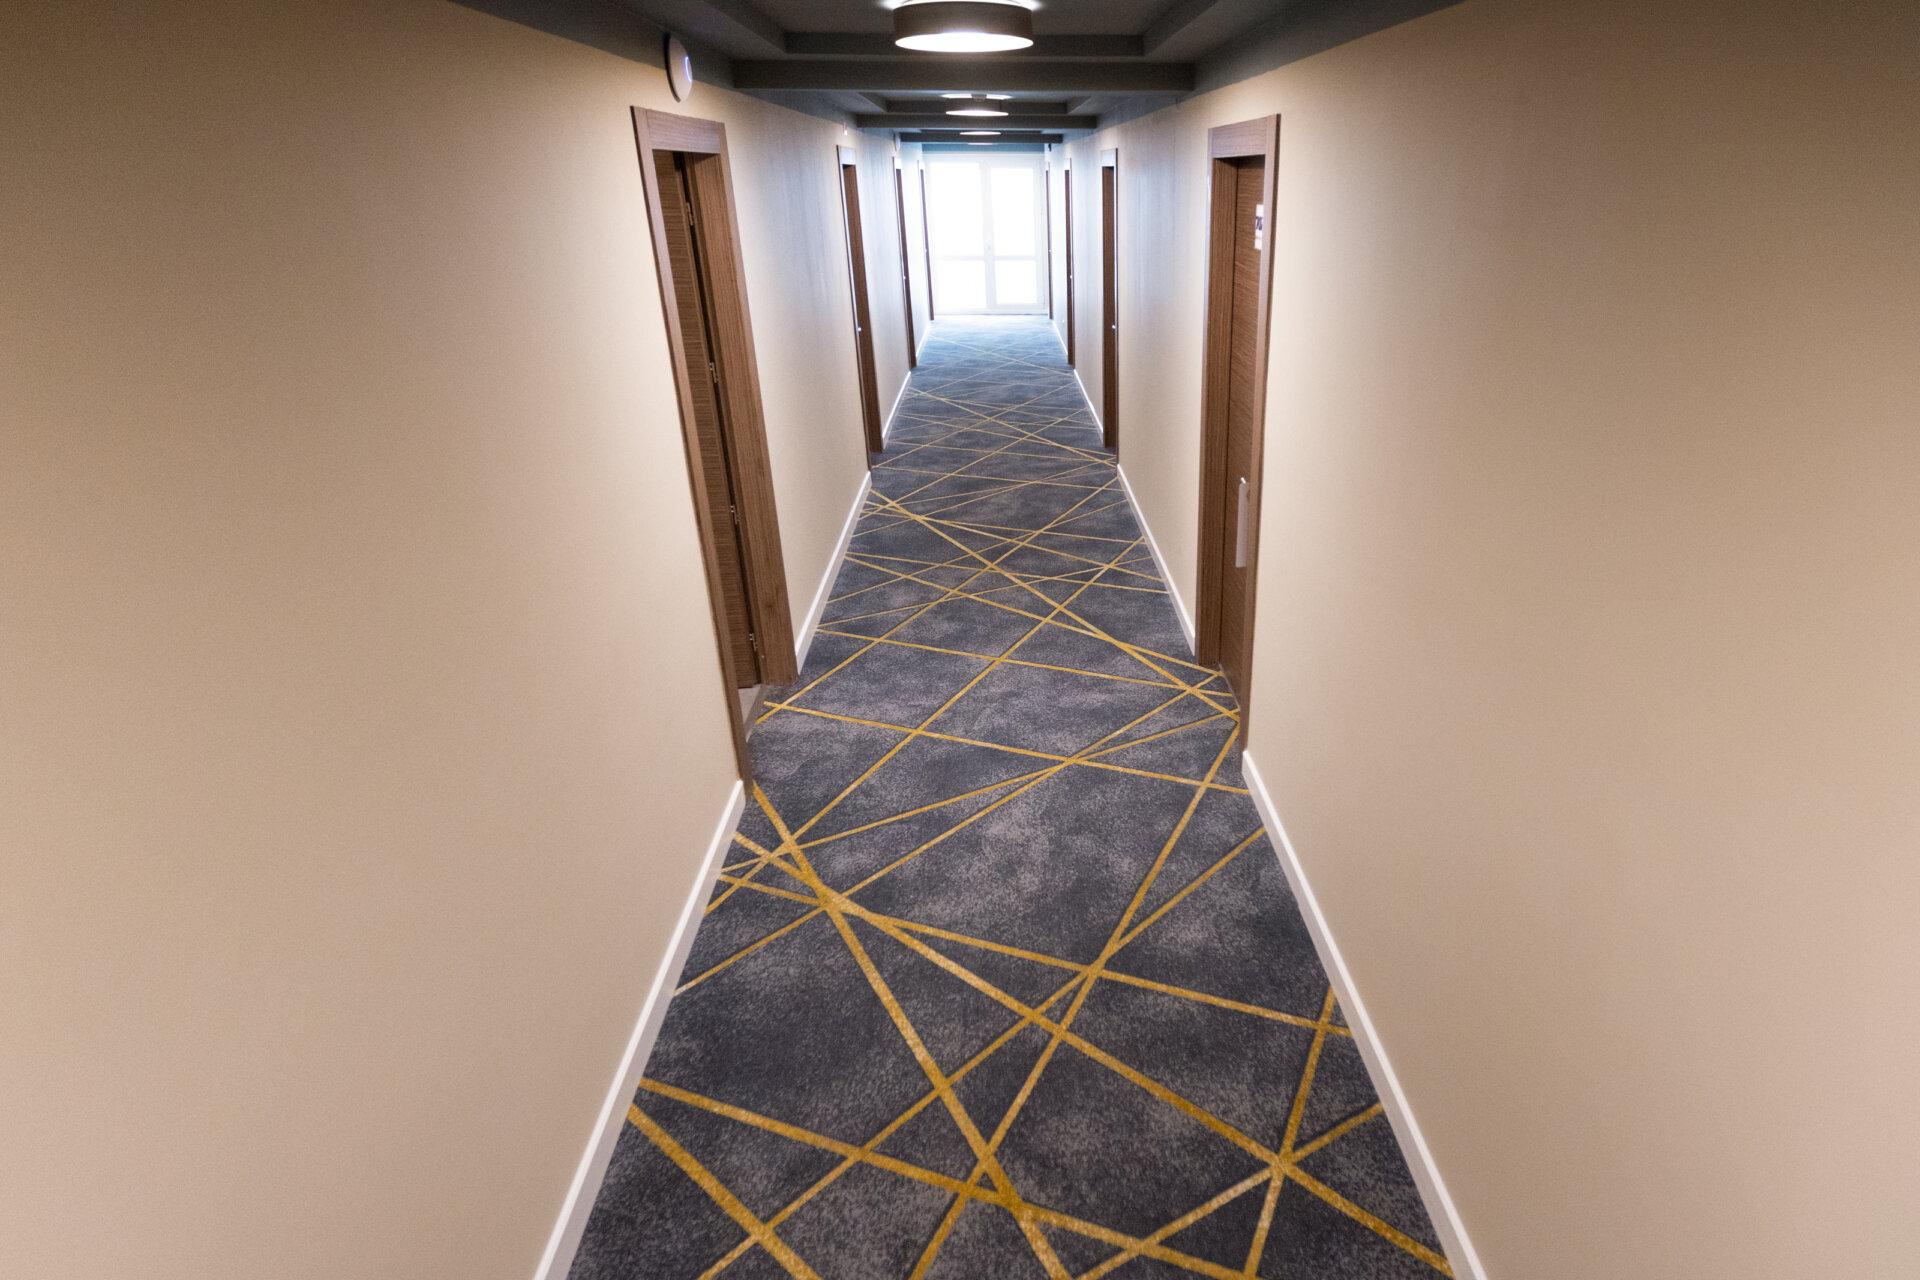 20210609-carpet&more-mercure-hotel-galati-by-hugmedia-14